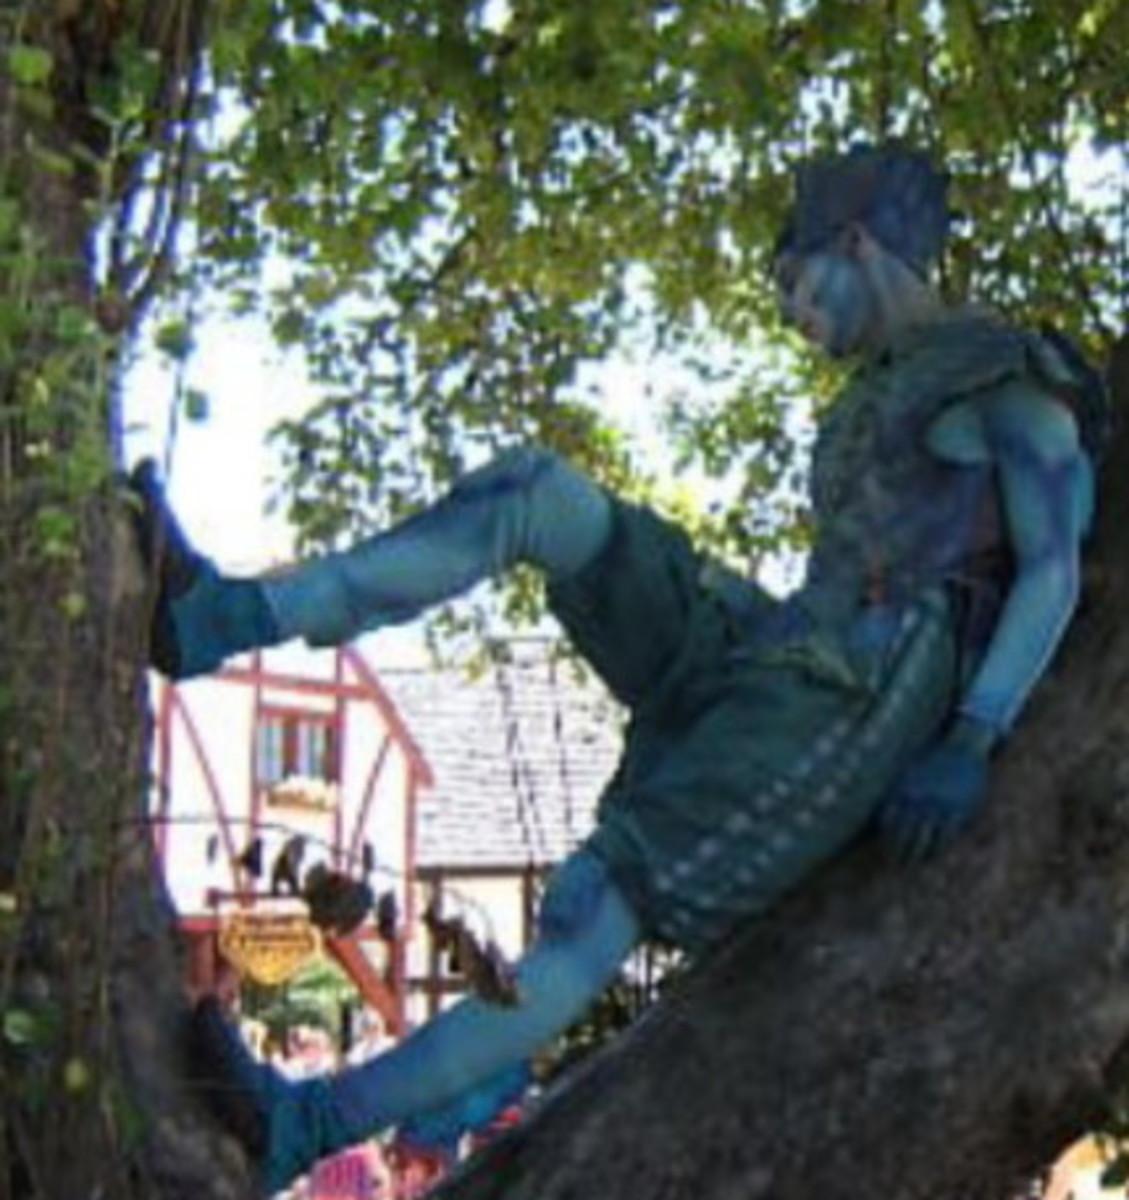 Elves, Faerys, Dwarves, Trolls and the Thunder Gods